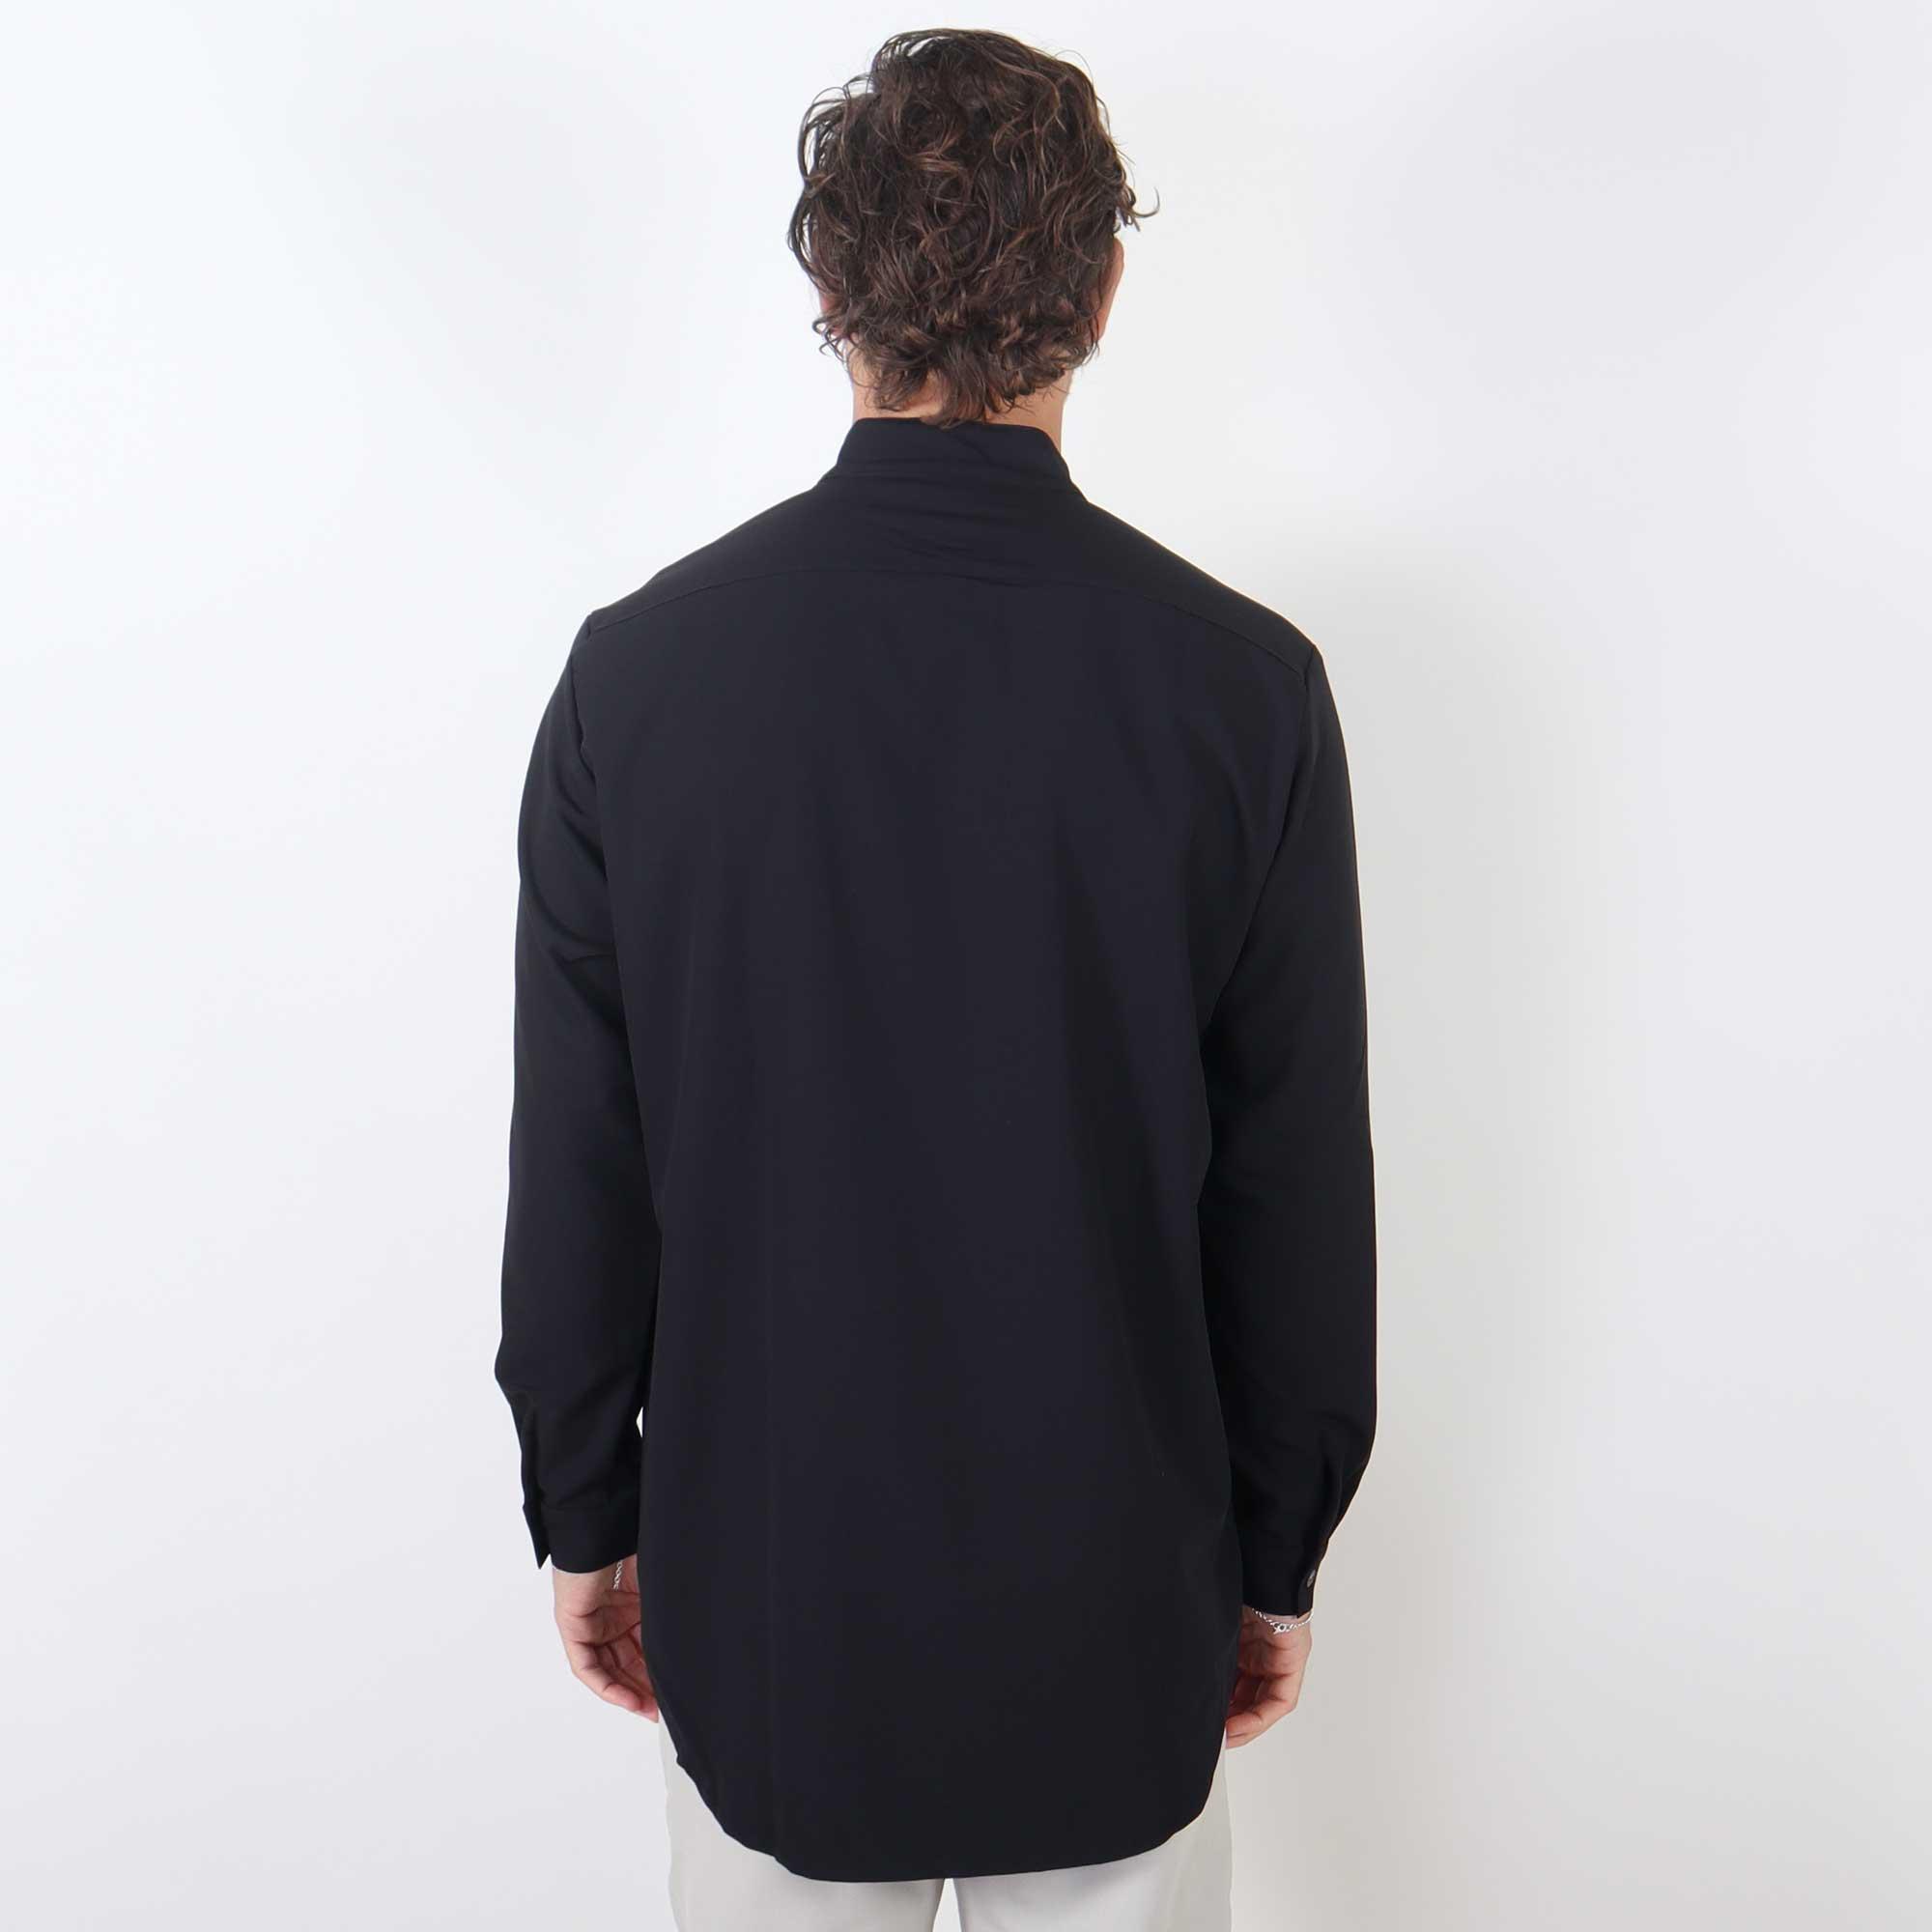 zippy-zwart-8